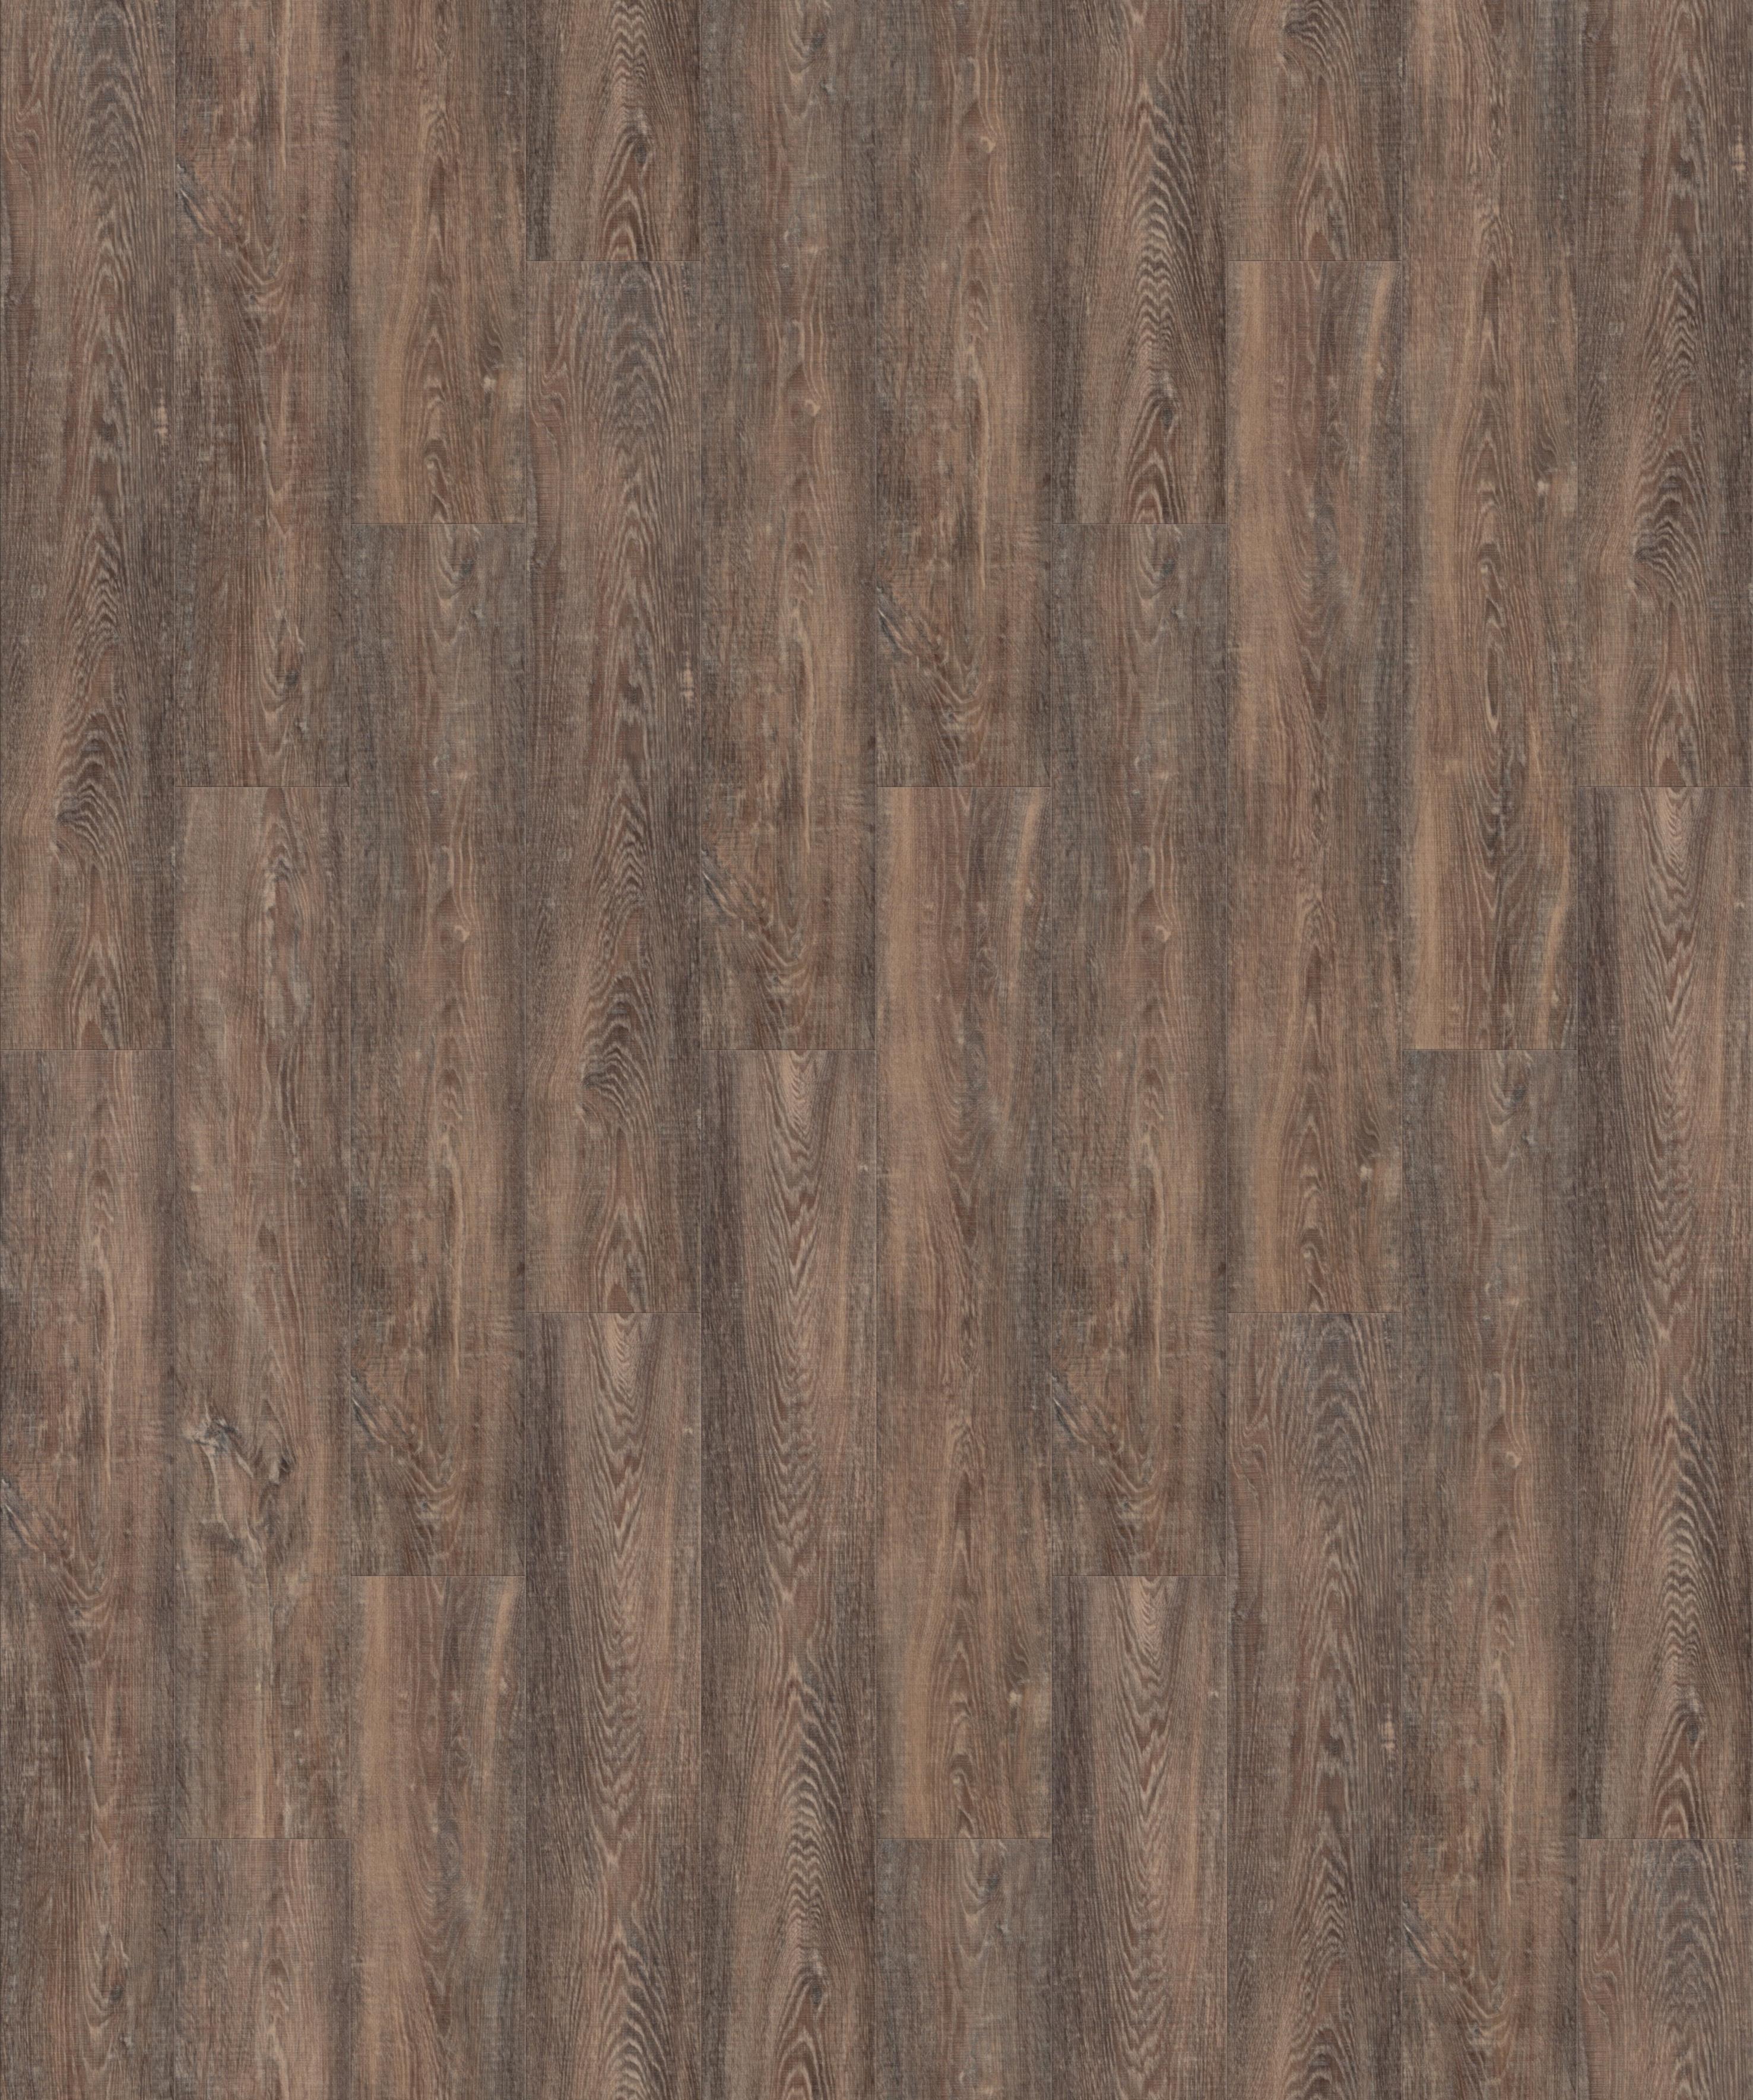 Realistic wood vinyl planks forbo flooring systems australia for Raw wood flooring